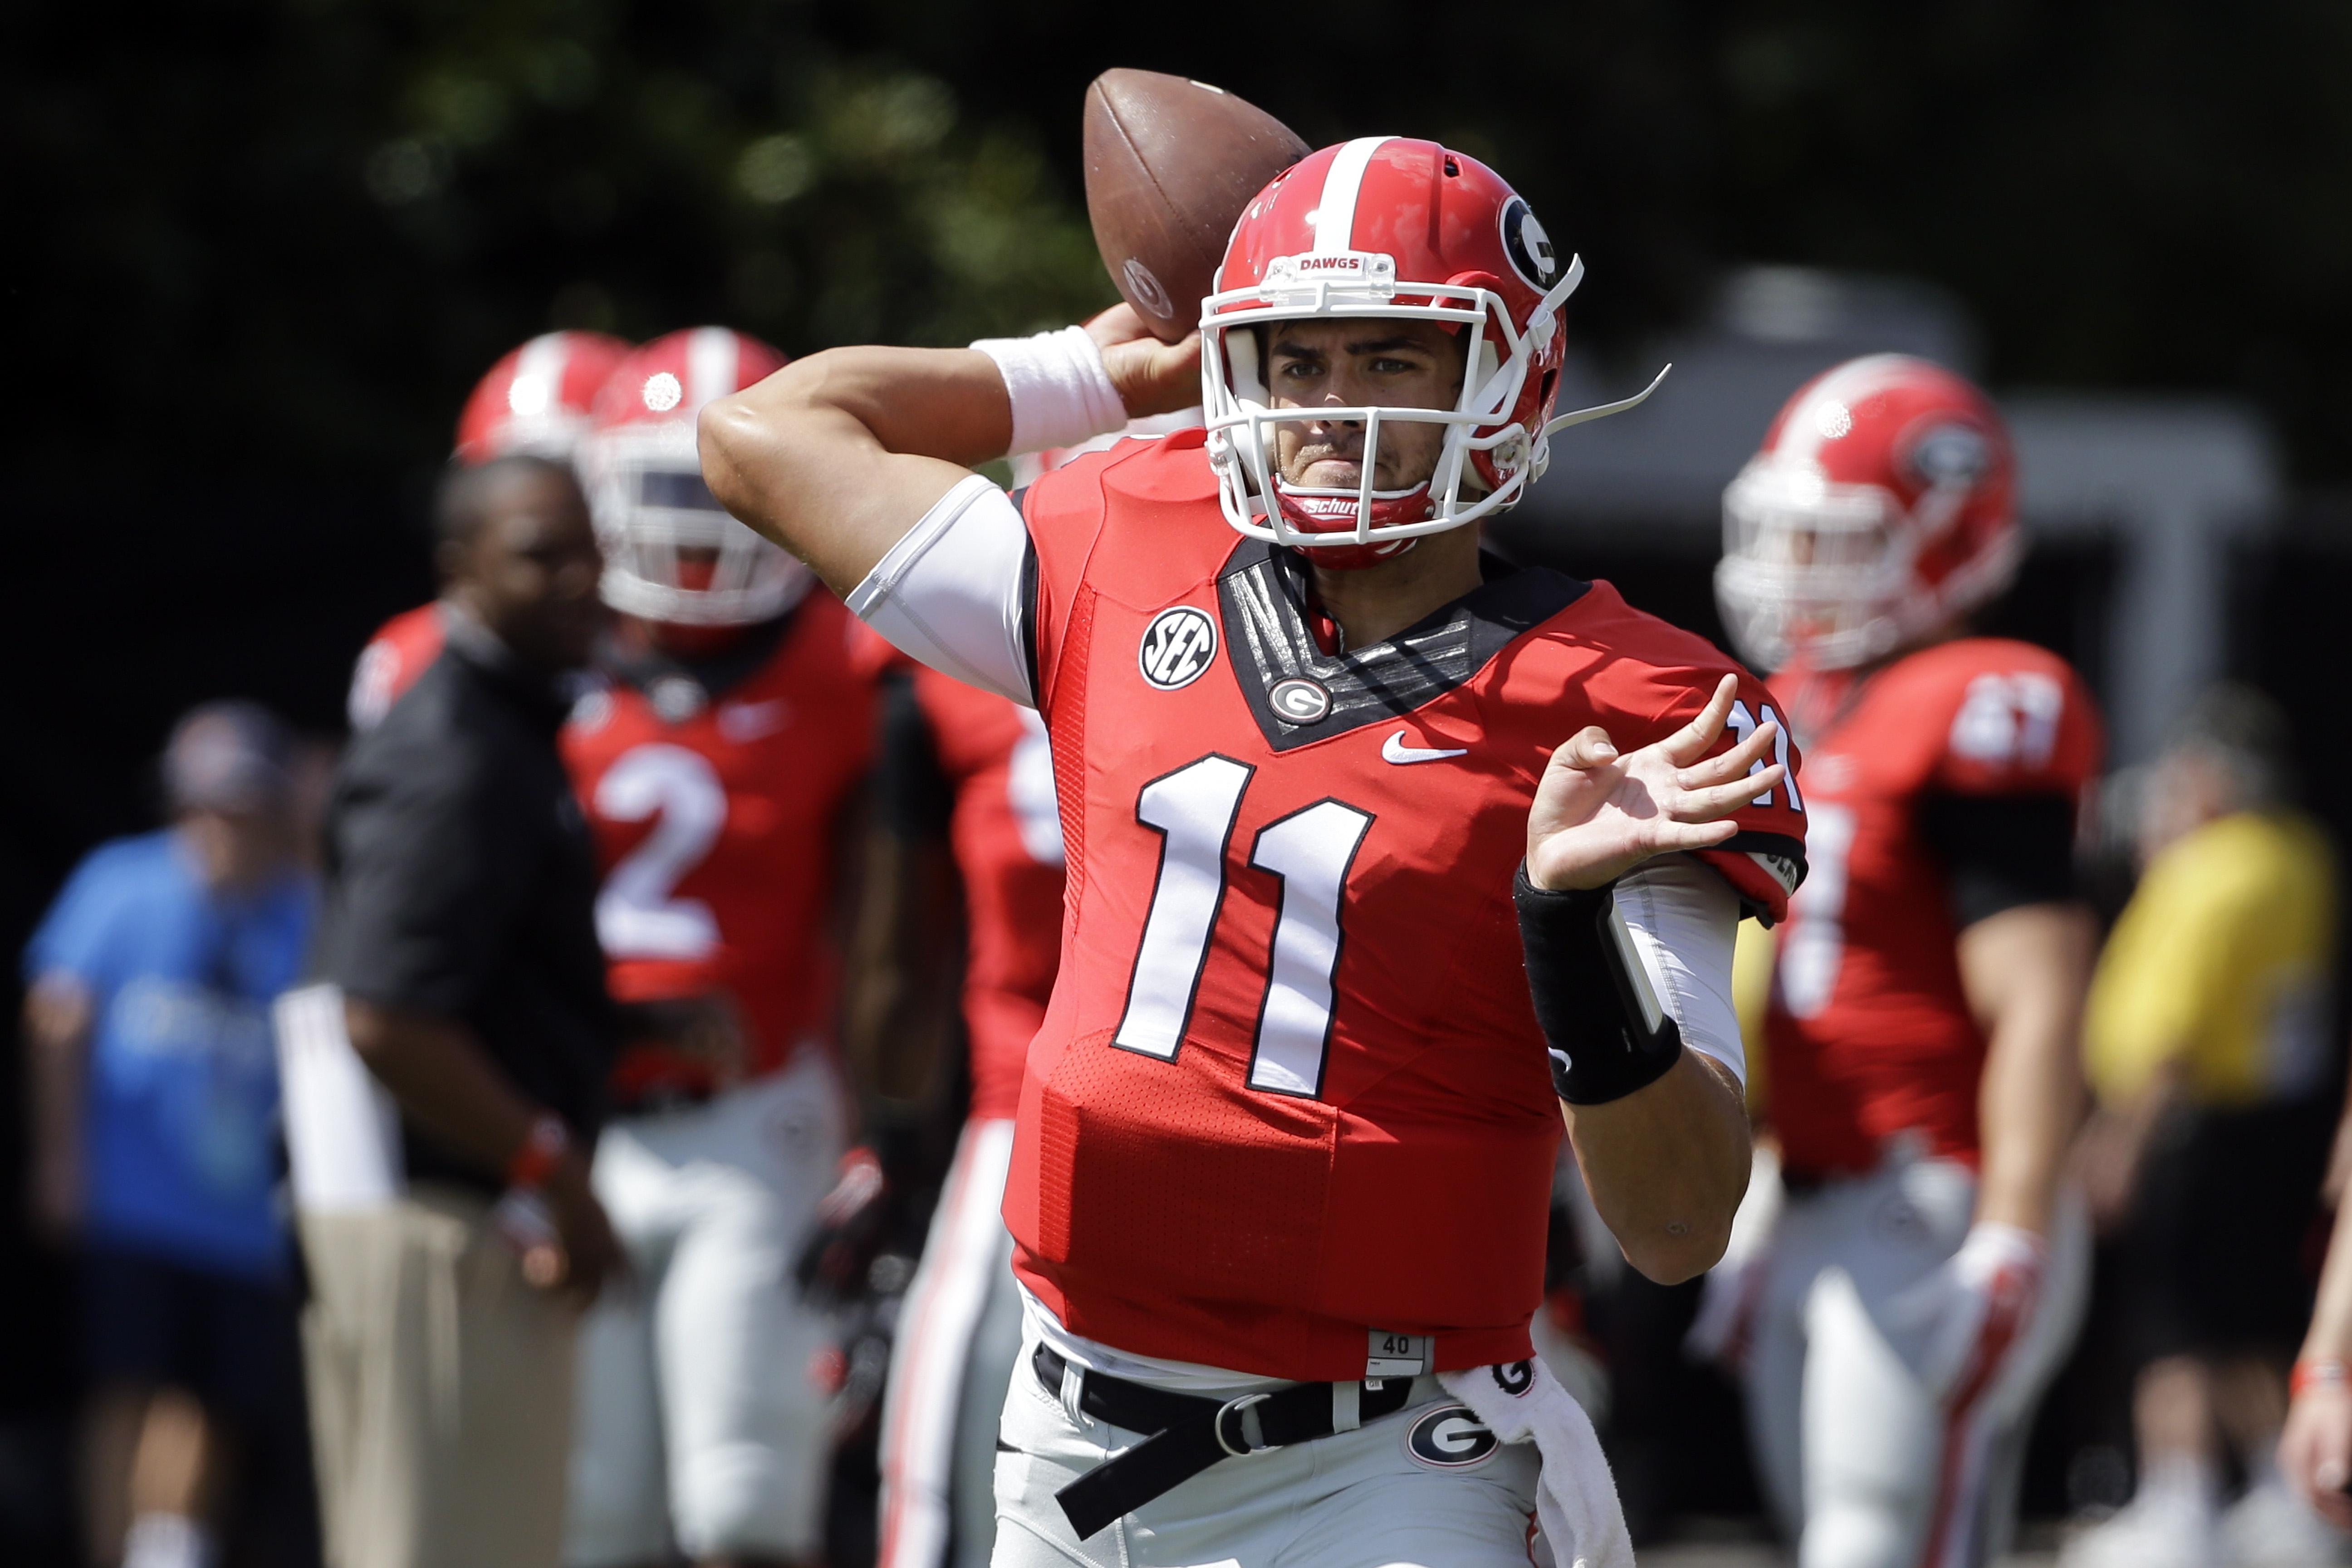 Georgia quarterback Greyson Lambert warms up before the start of an NCAA college football game against Vanderbilt Saturday, Sept. 12, 2015, in Nashville, Tenn. (AP Photo/Mark Humphrey)